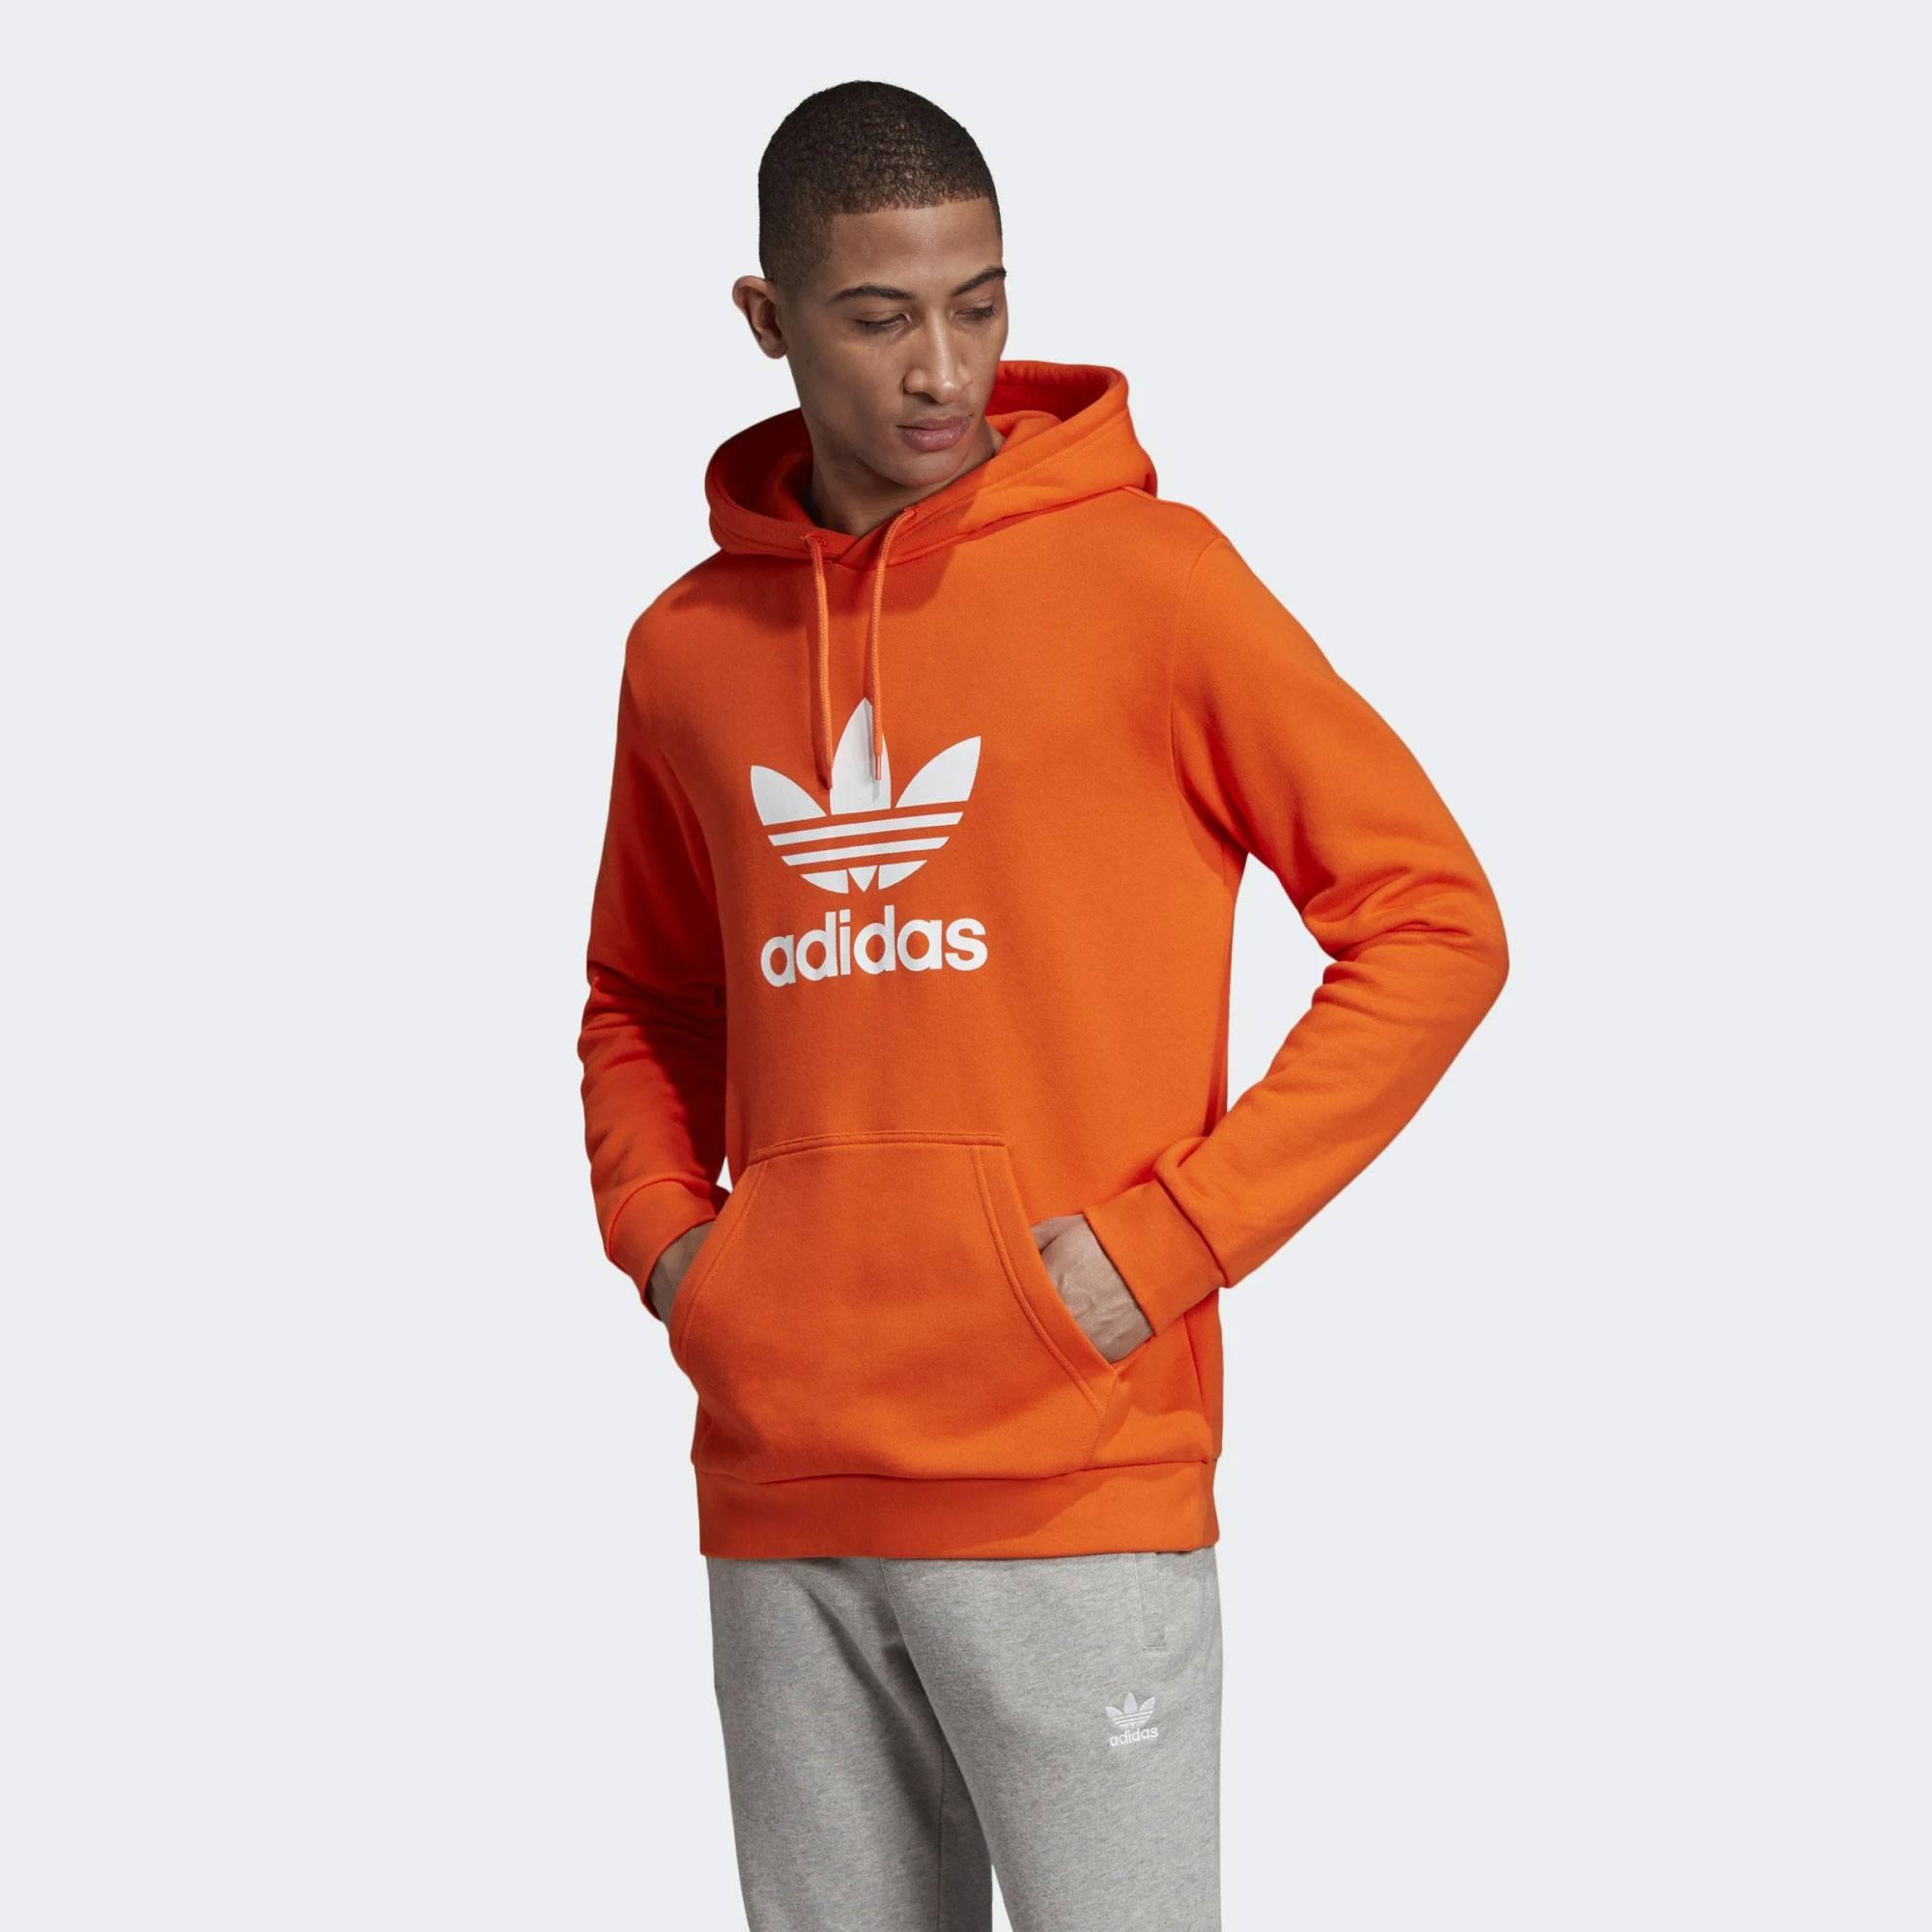 adidas Originals Trefoil Hoodie (9000033335_3236)